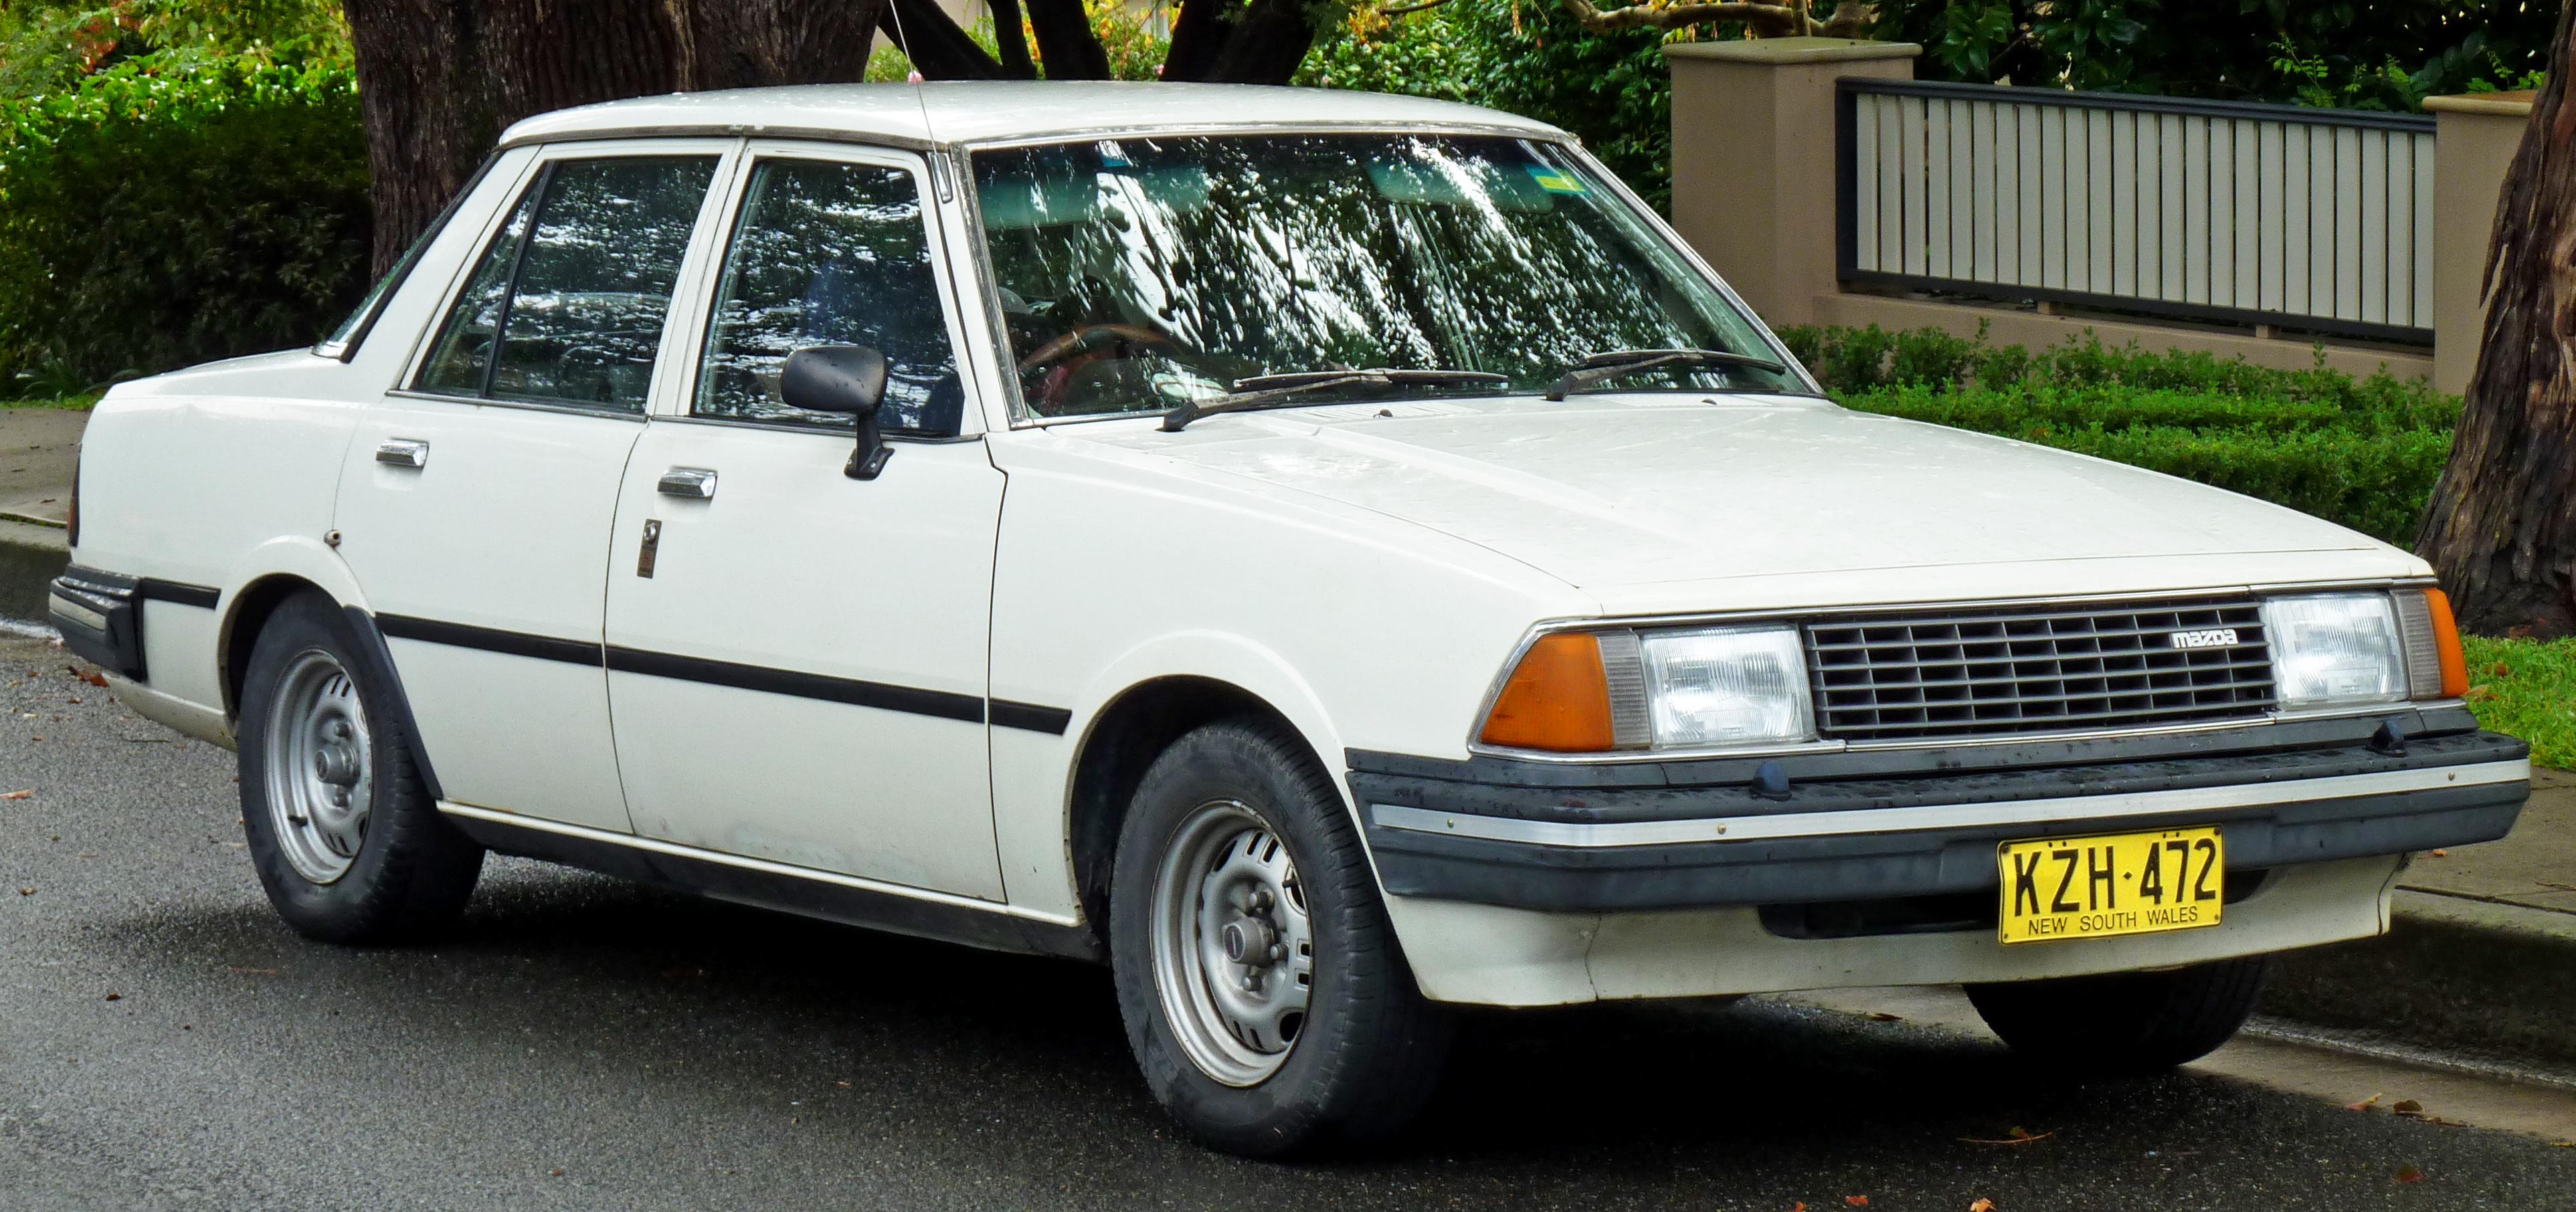 Mazda 626 I (CB) 1978 - 1982 Sedan #5